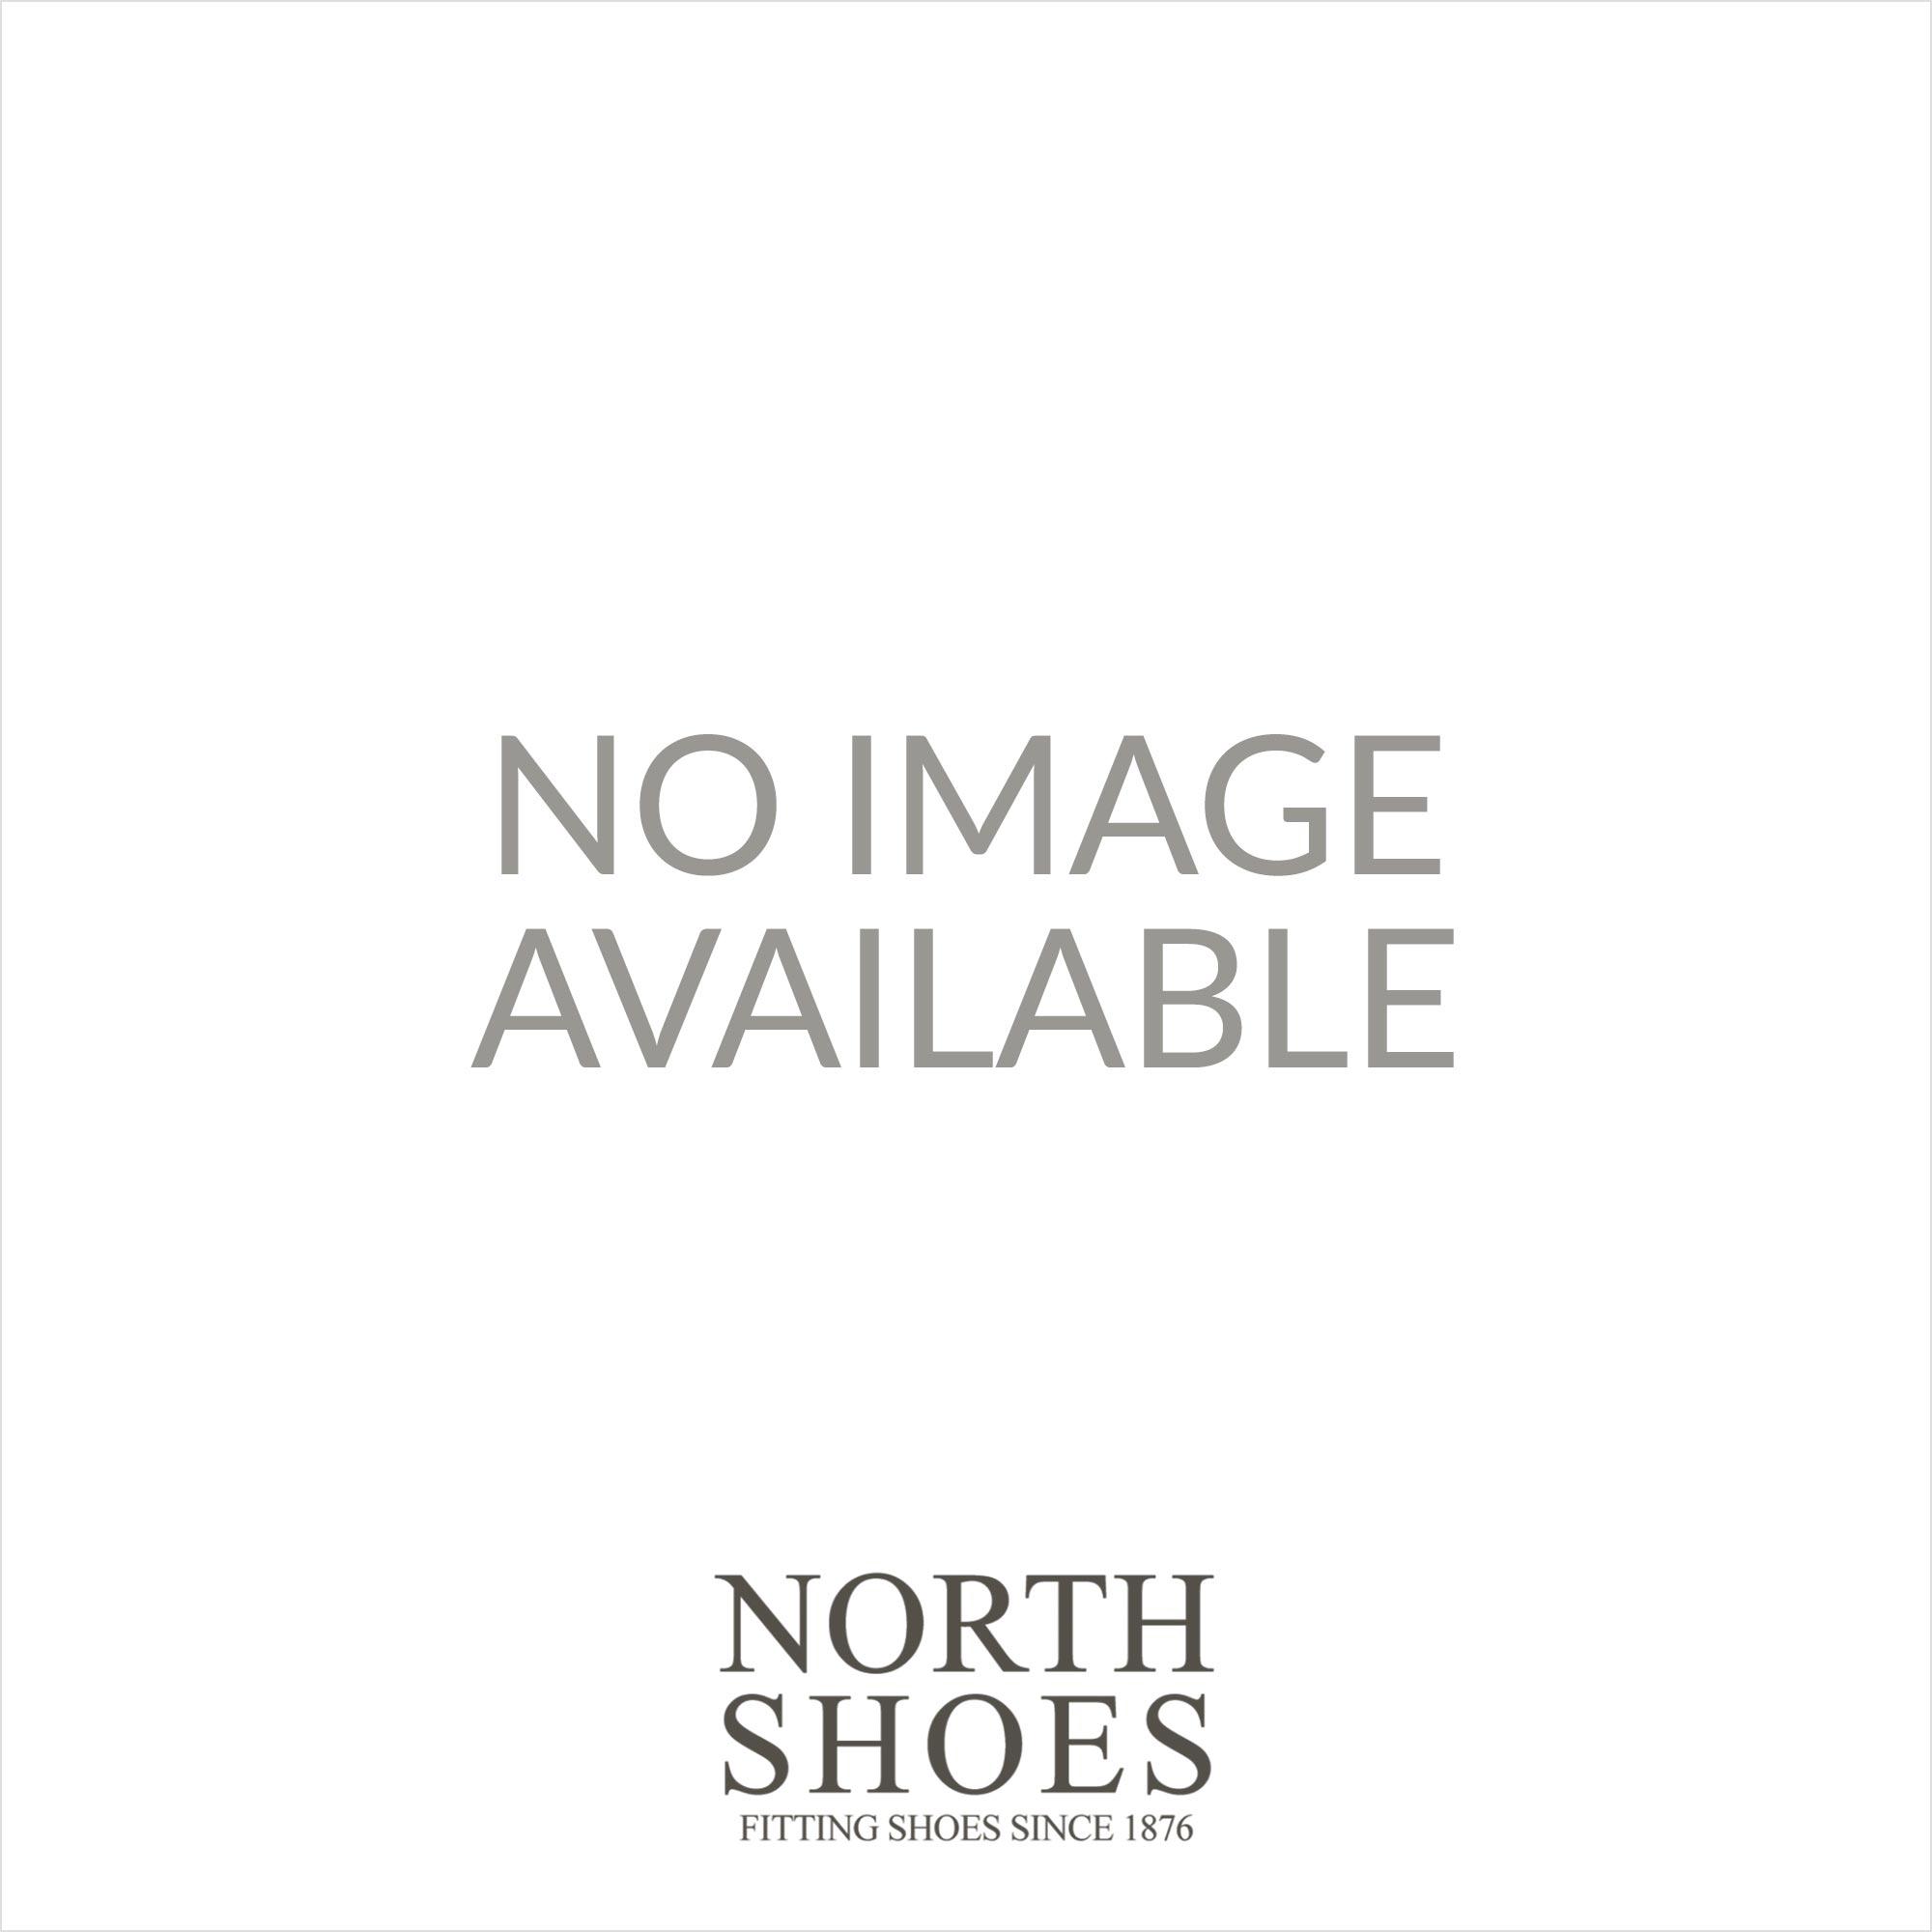 7e127de59612 ... Converse Chuck Taylor All Star Classic 330123C Royal Blue Canvas Unisex  Lace Up Hi Top Sneaker ...